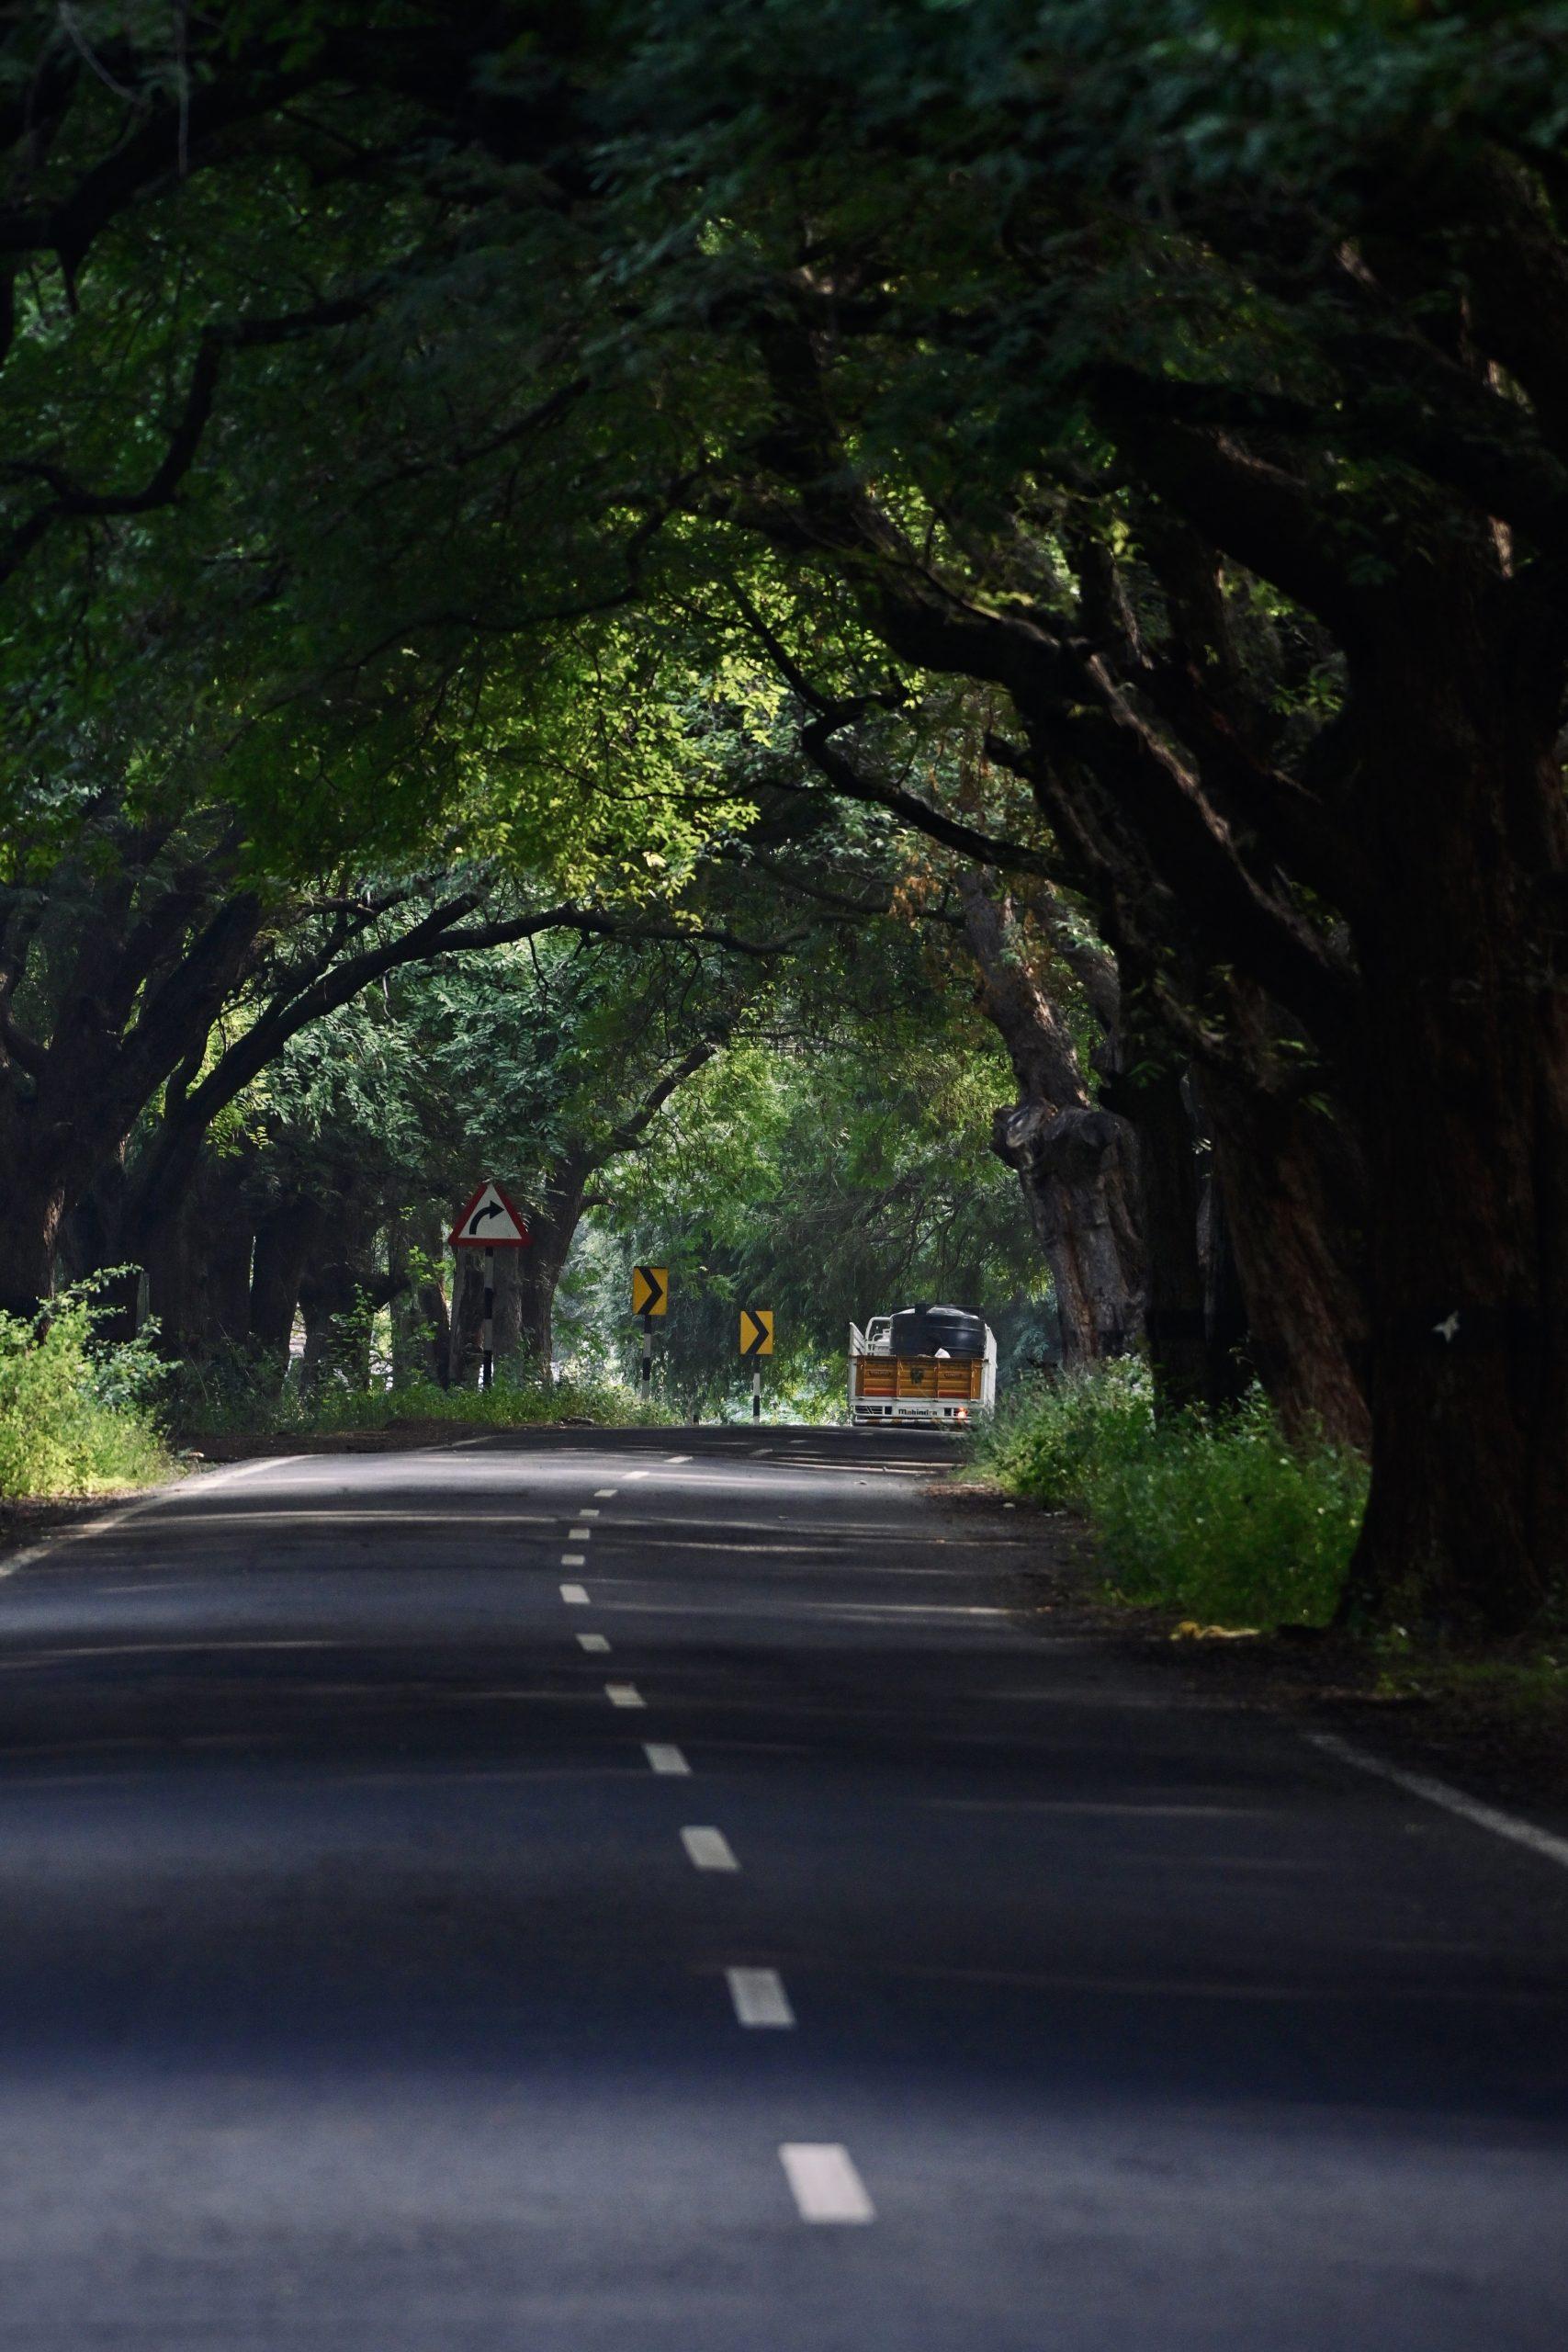 trees alongside road